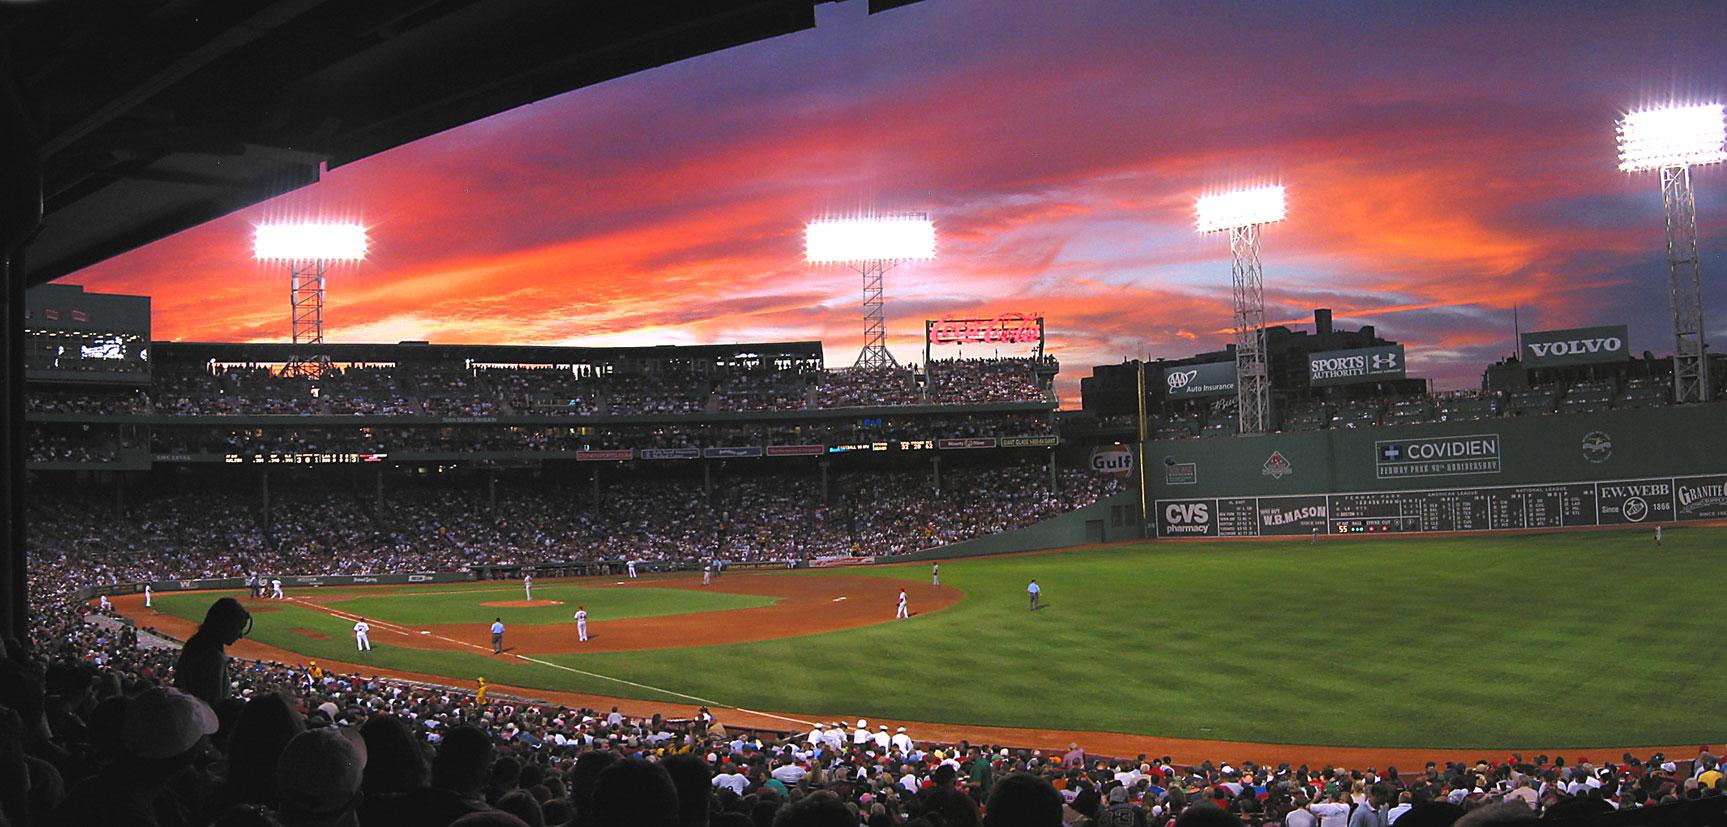 красивые закаты на бейсбольных стадионах / baseball park sunset - fenway park, boston